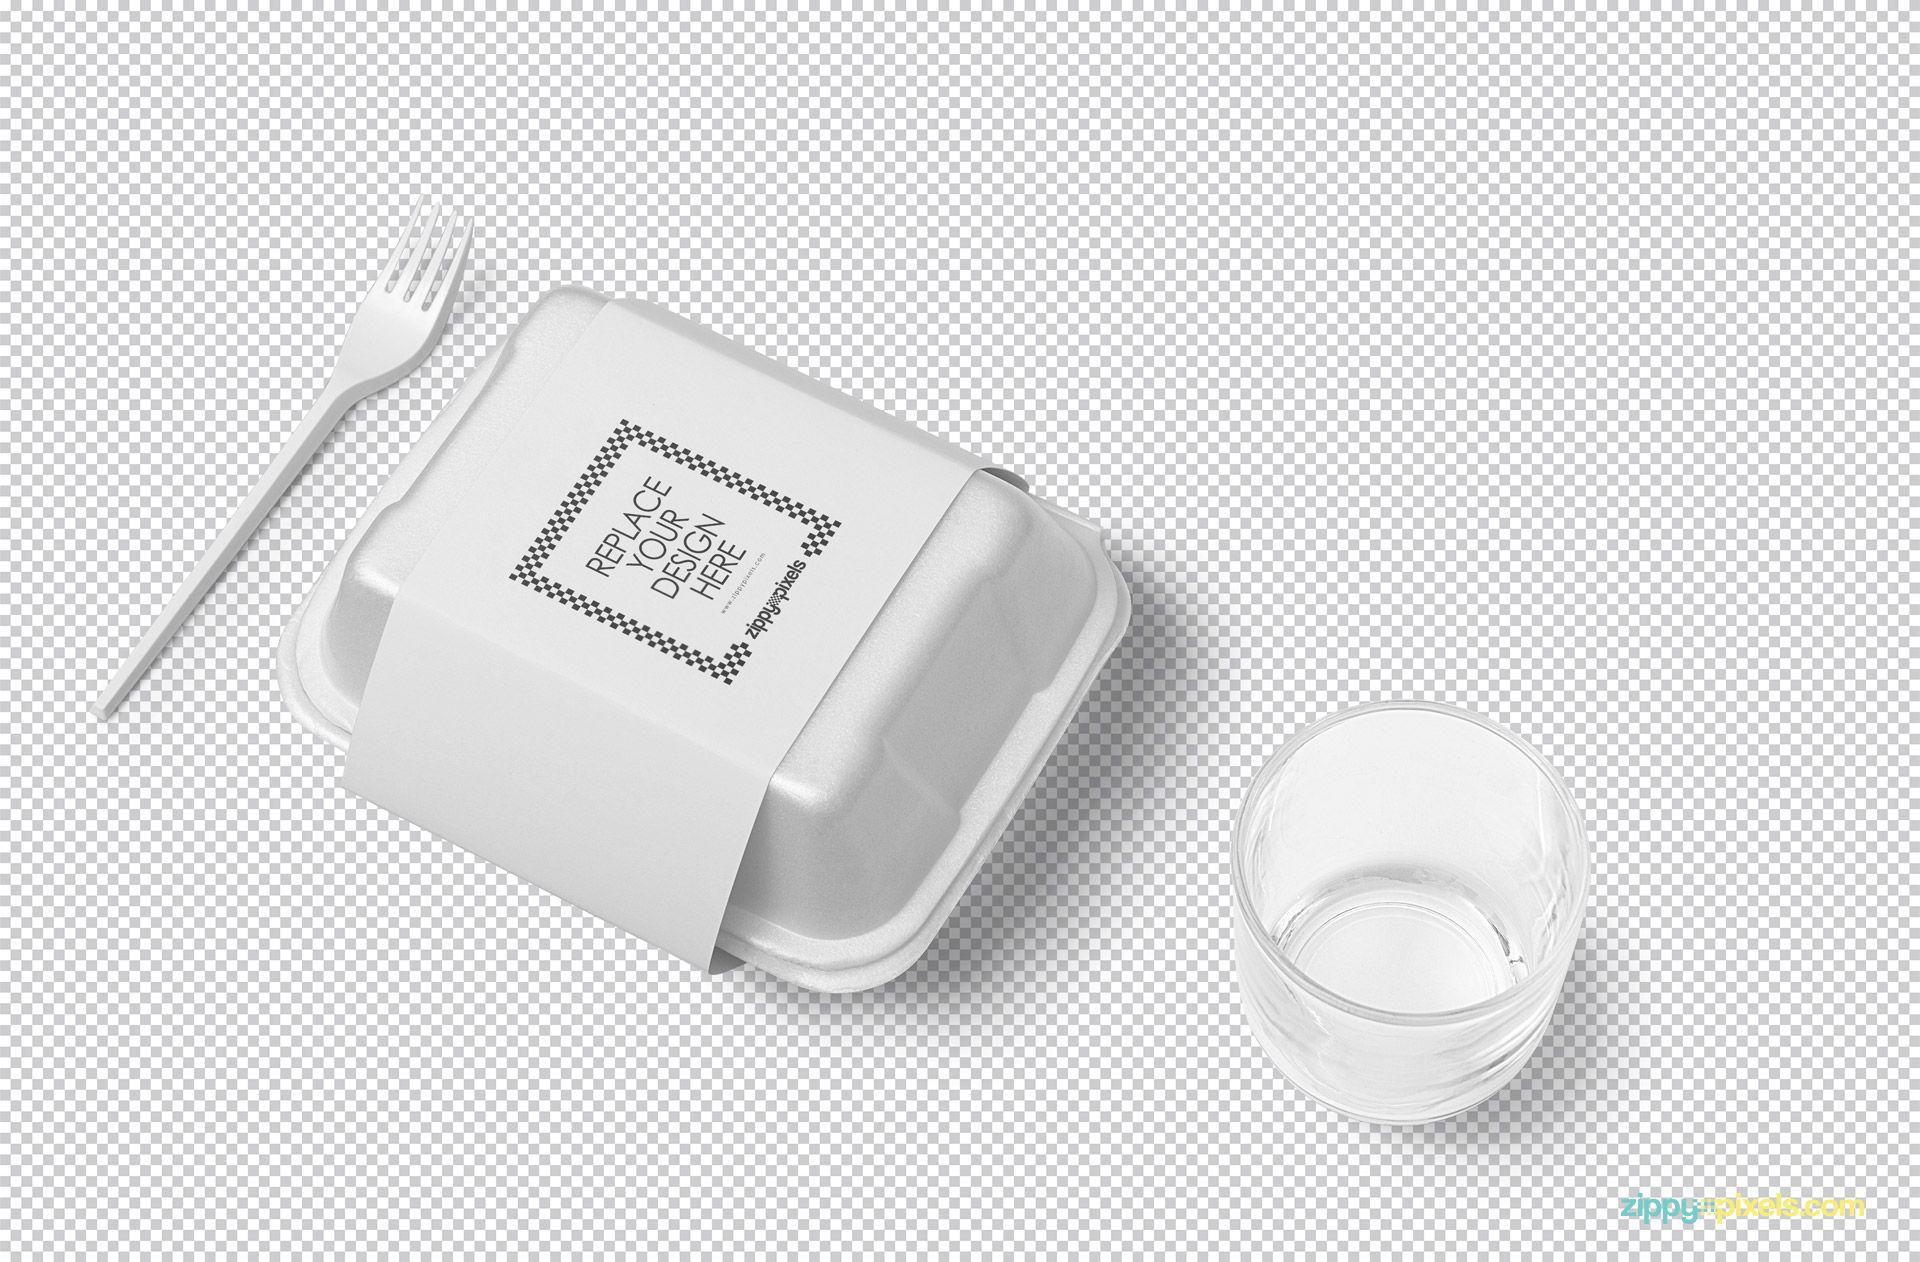 Download Free Disposable Food Packaging Mockup Zippypixels Food Box Packaging Food Packaging Packaging Mockup